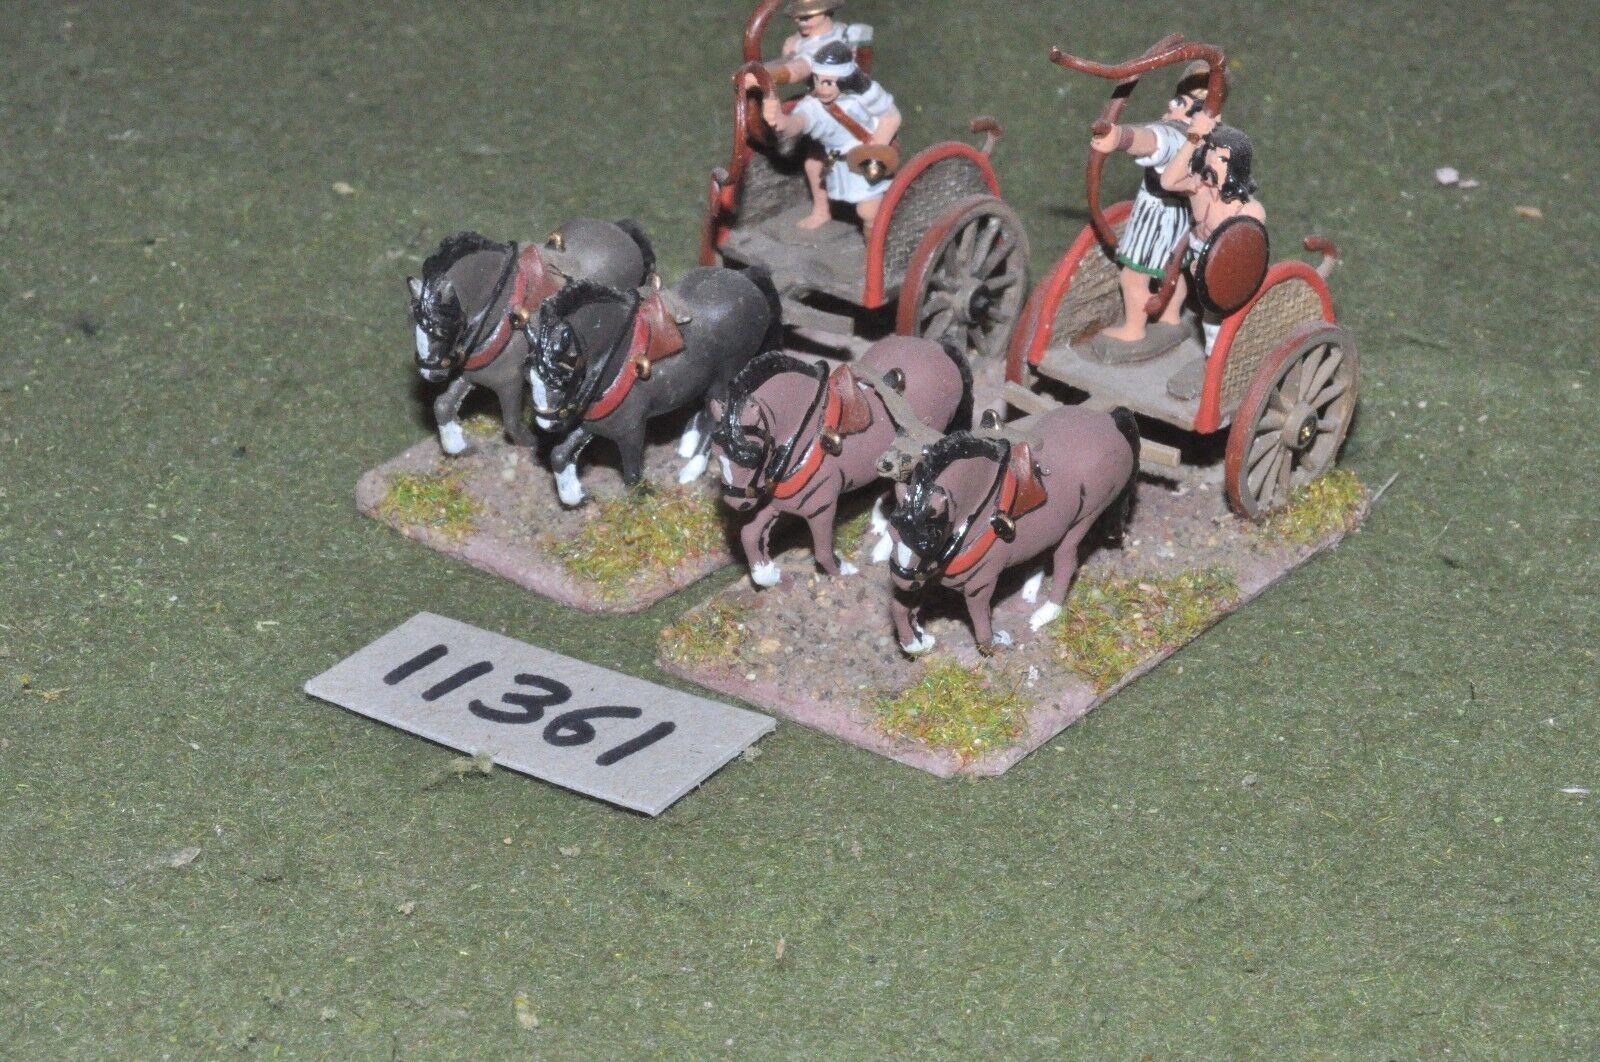 25mm medieval medieval medieval   gasgan - chariots 2 chariots - chariots (11361) ff1bfa